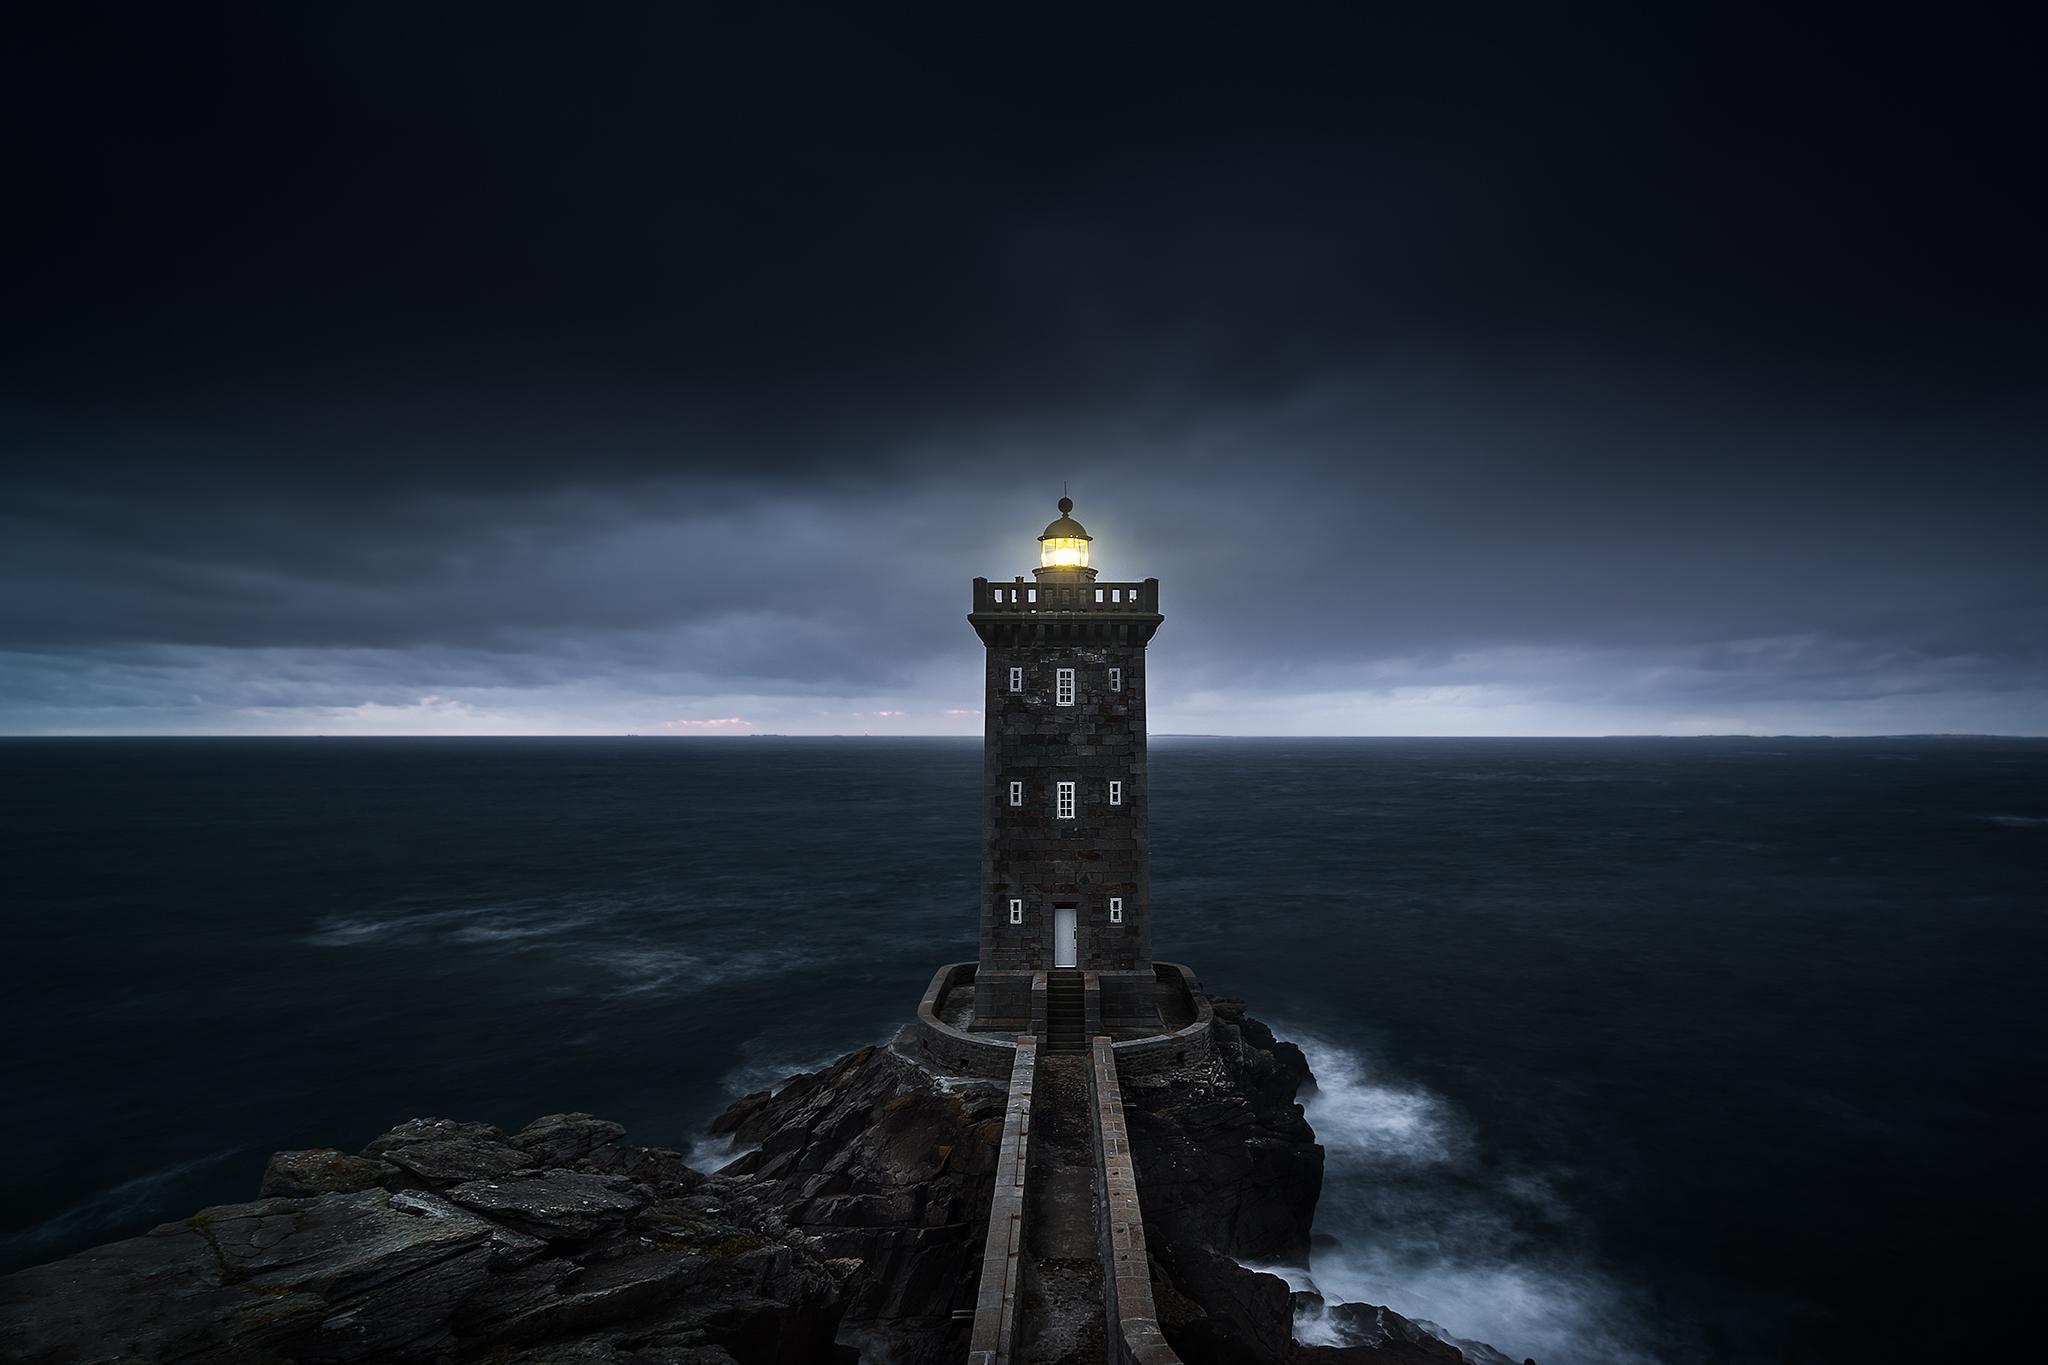 Lighthouse of Kermorvan, France